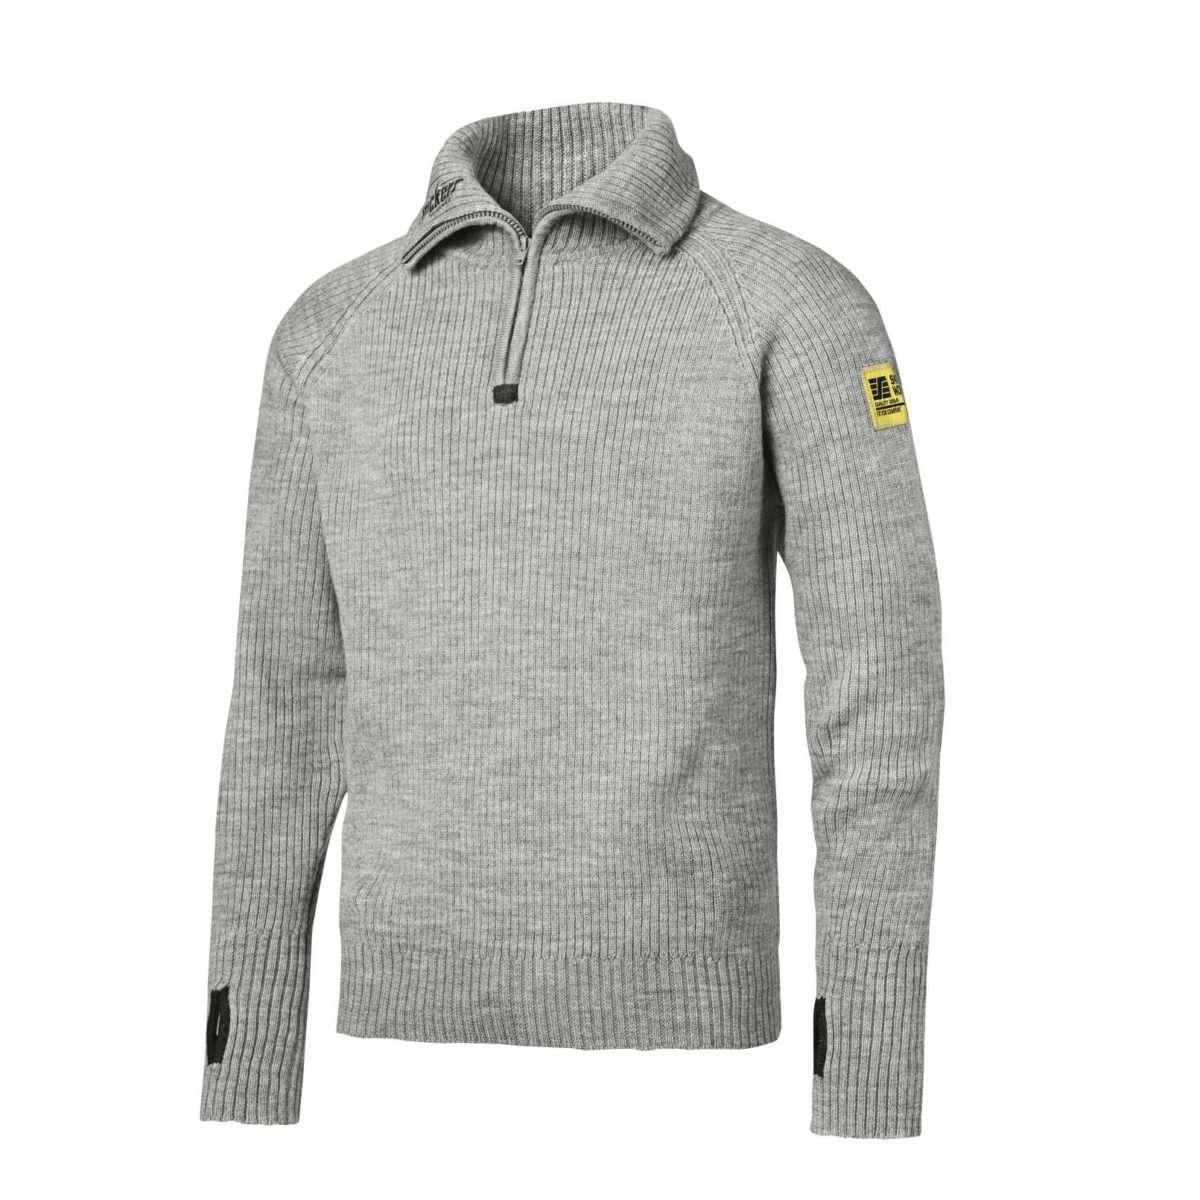 Snickers 2905 ½-Zip Wool Sweater